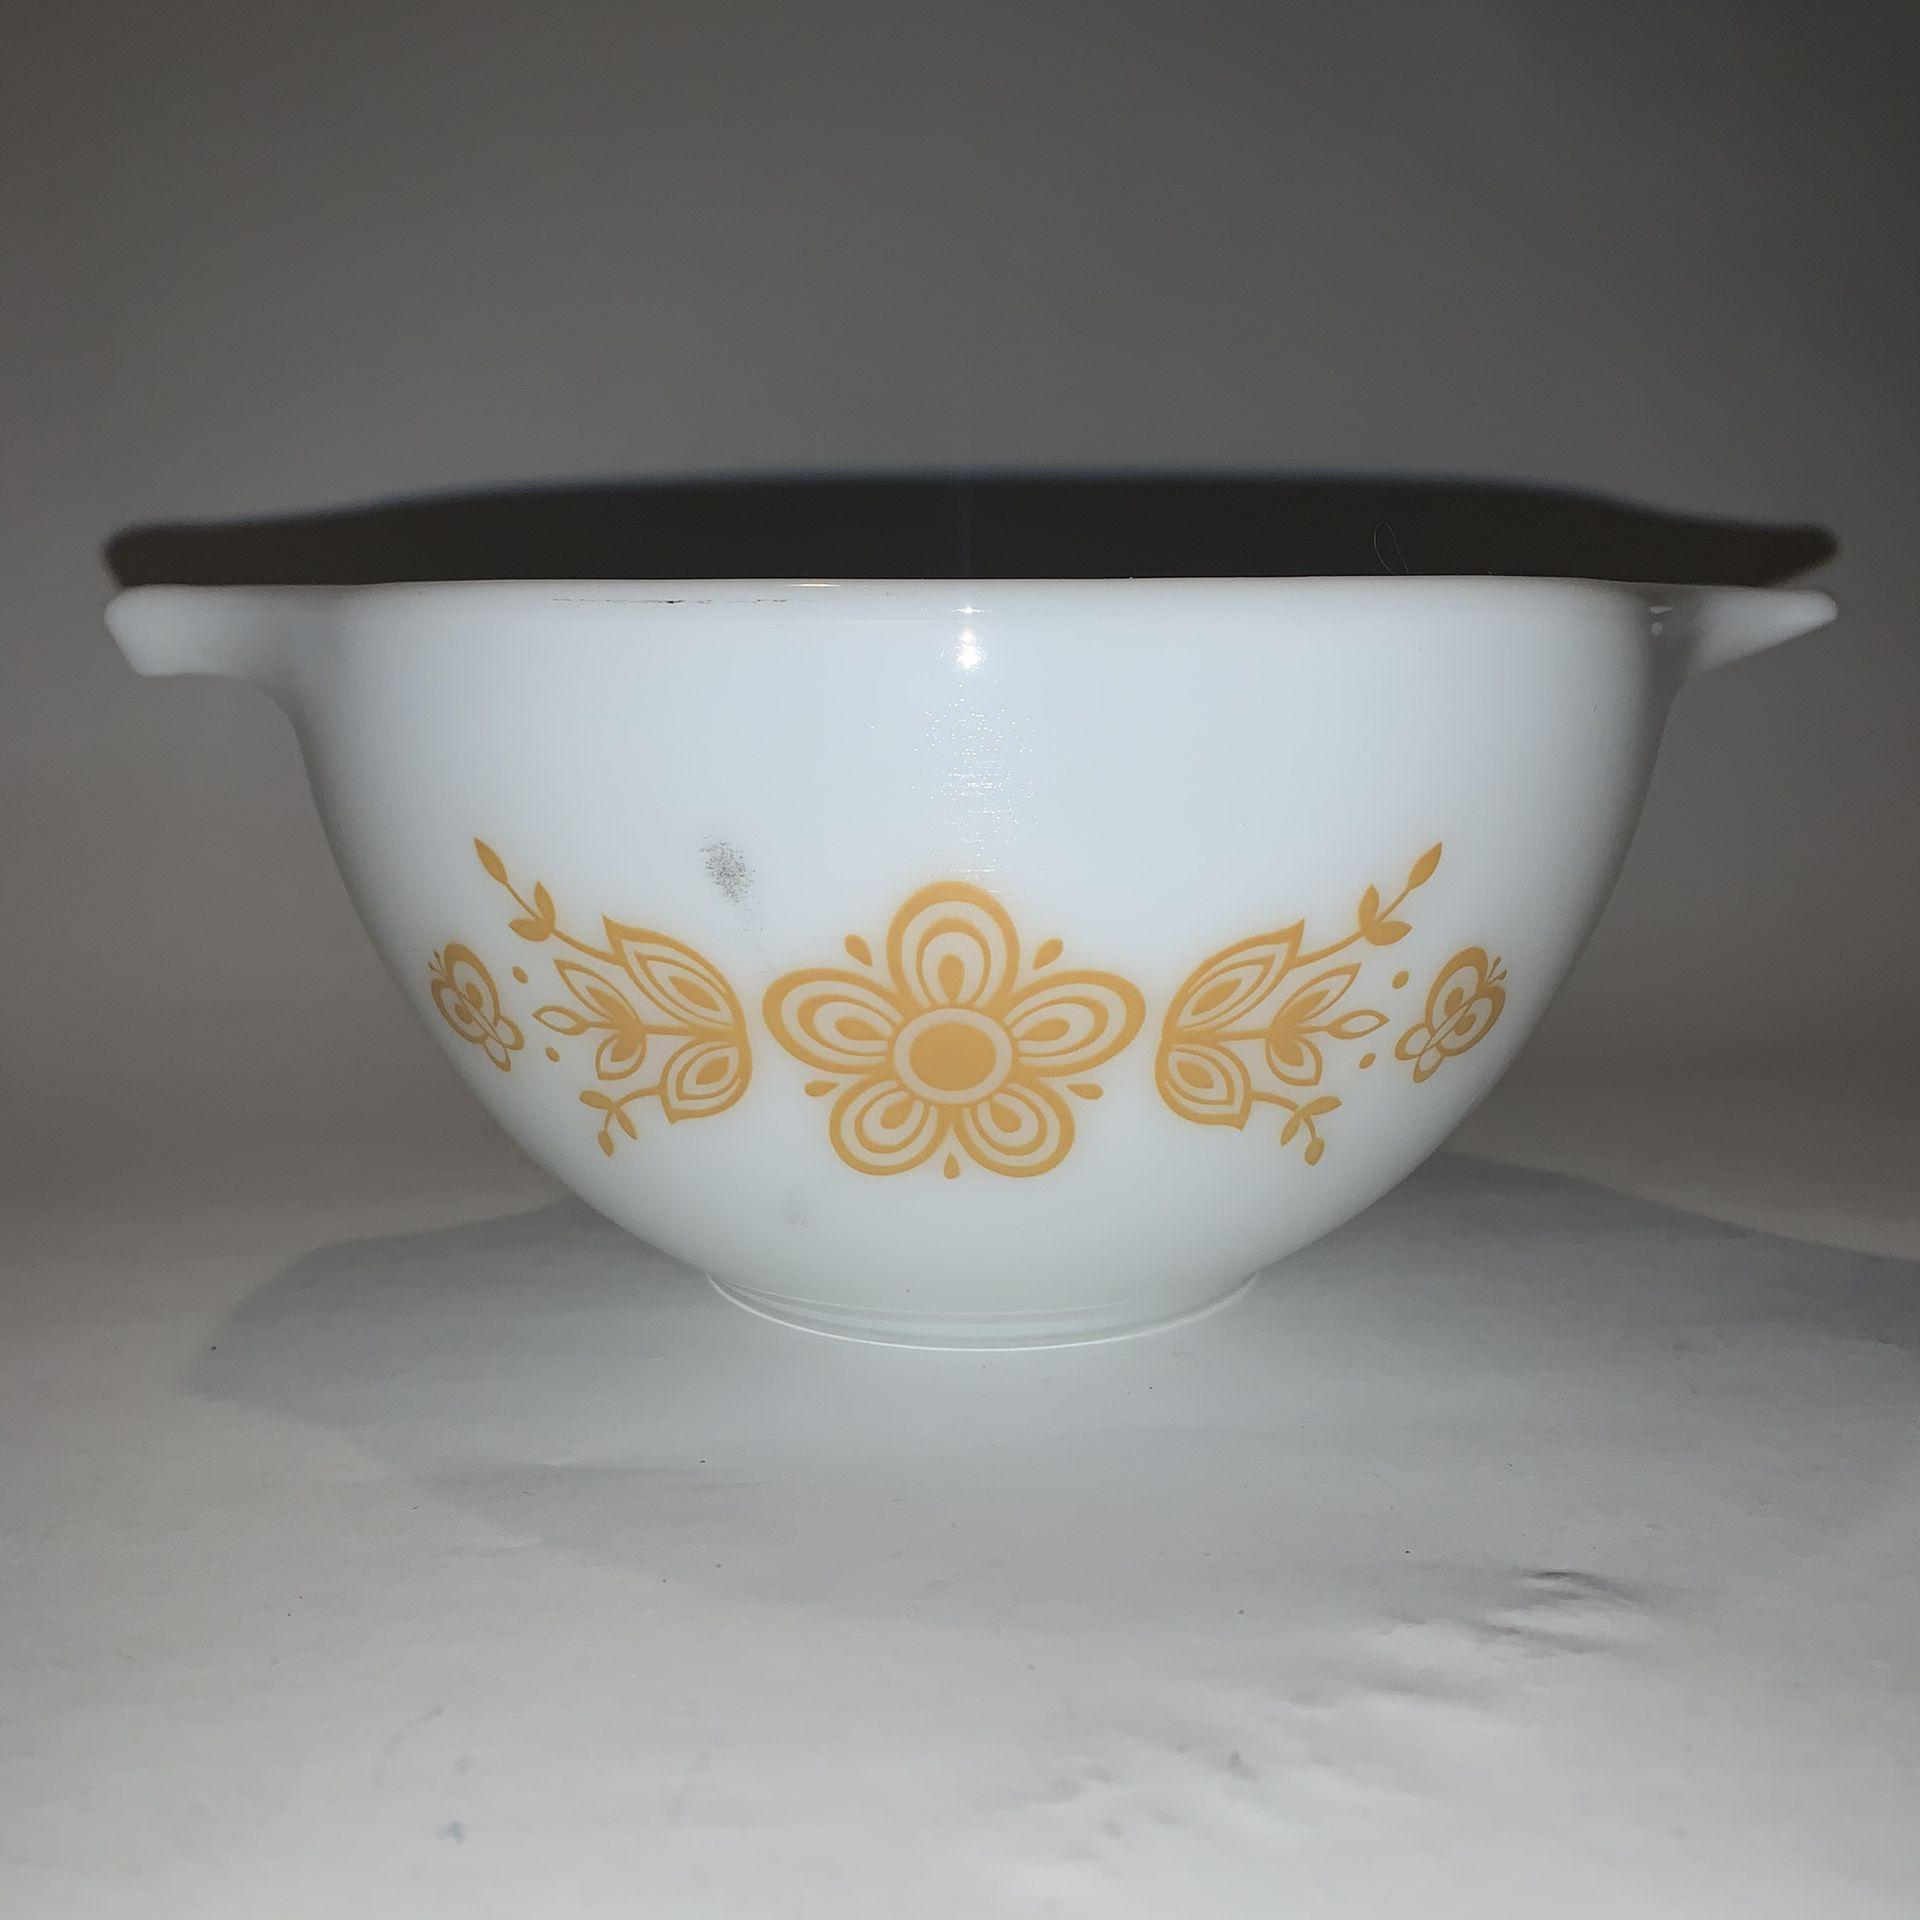 Vintage PYREX BUTTERFLY GOLD Nesting Bowl White #443 750 ml